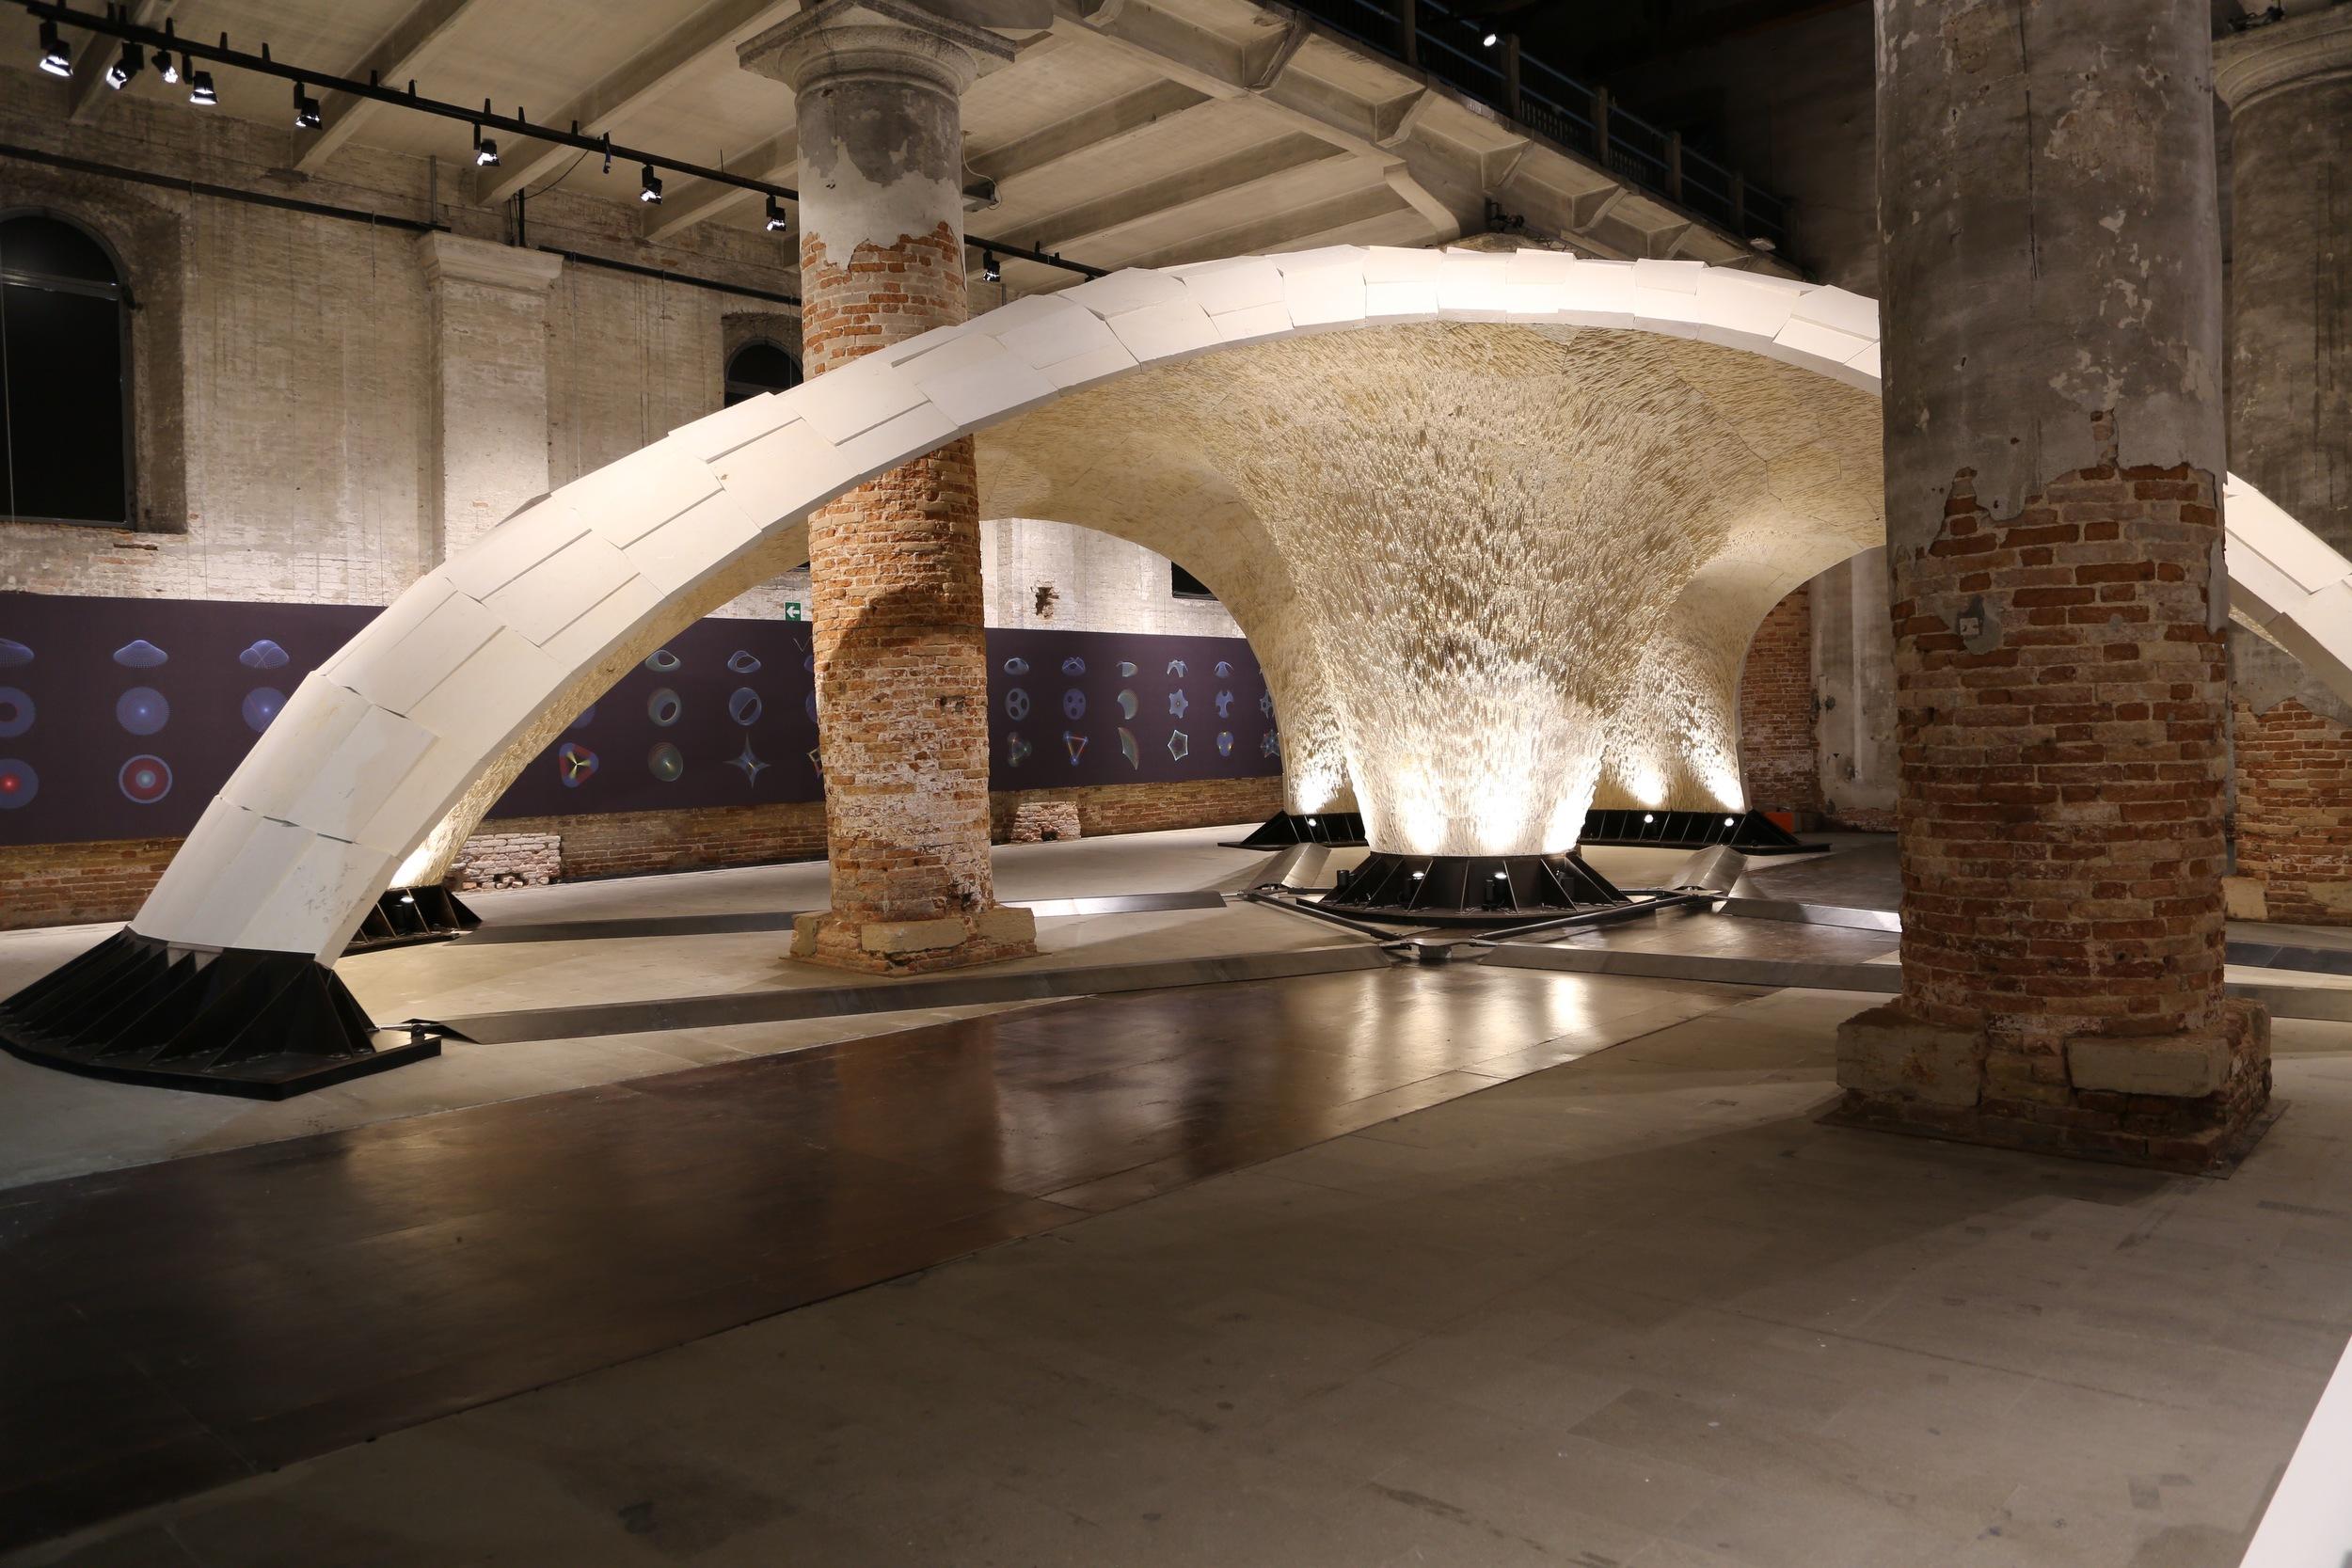 ARMADILLO VAULT in the La Biennale di Venezia– Architettura 2016  See   http://www.armadillovault.com   for more details